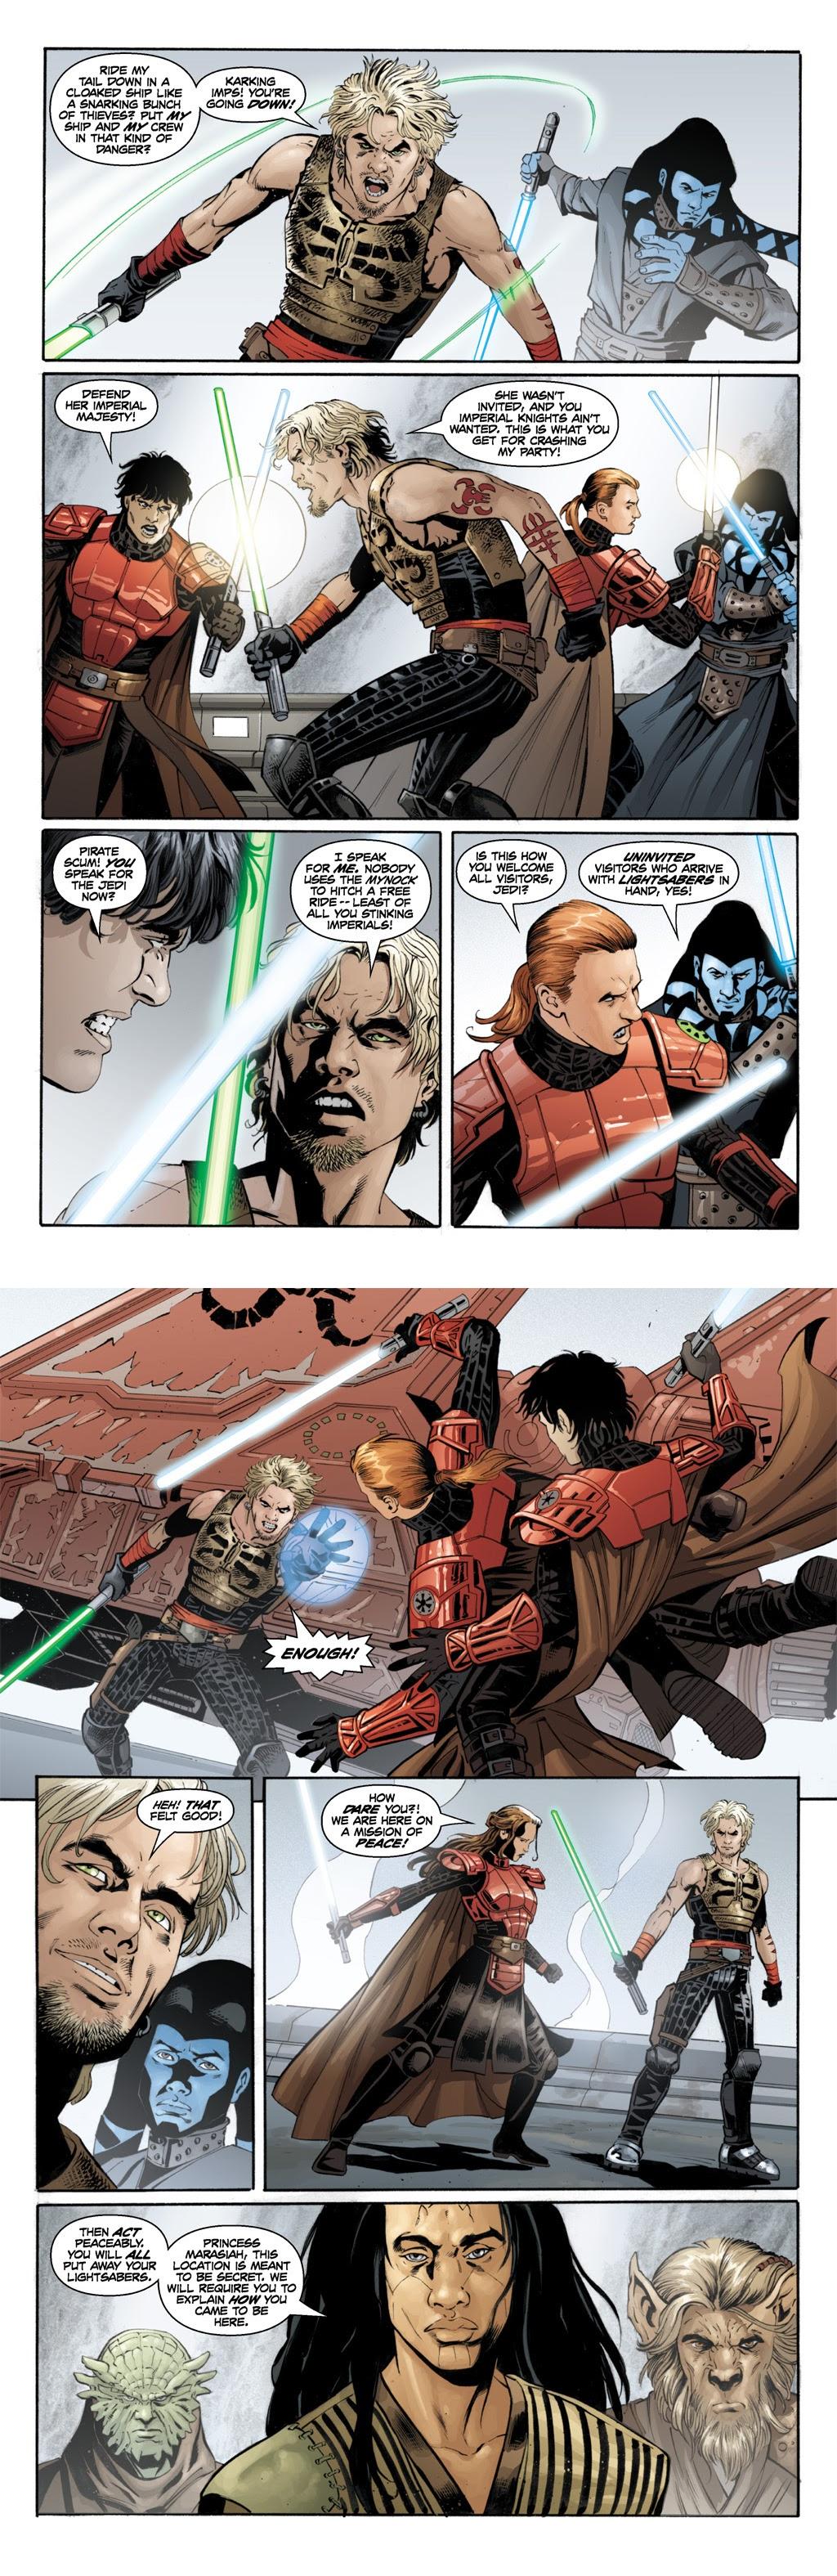 Stomper Showdown R2 #8 - Antares Draco (Informal Geek) vs TUF! Jacen Solo (RNGesus4) Cade_Force_push